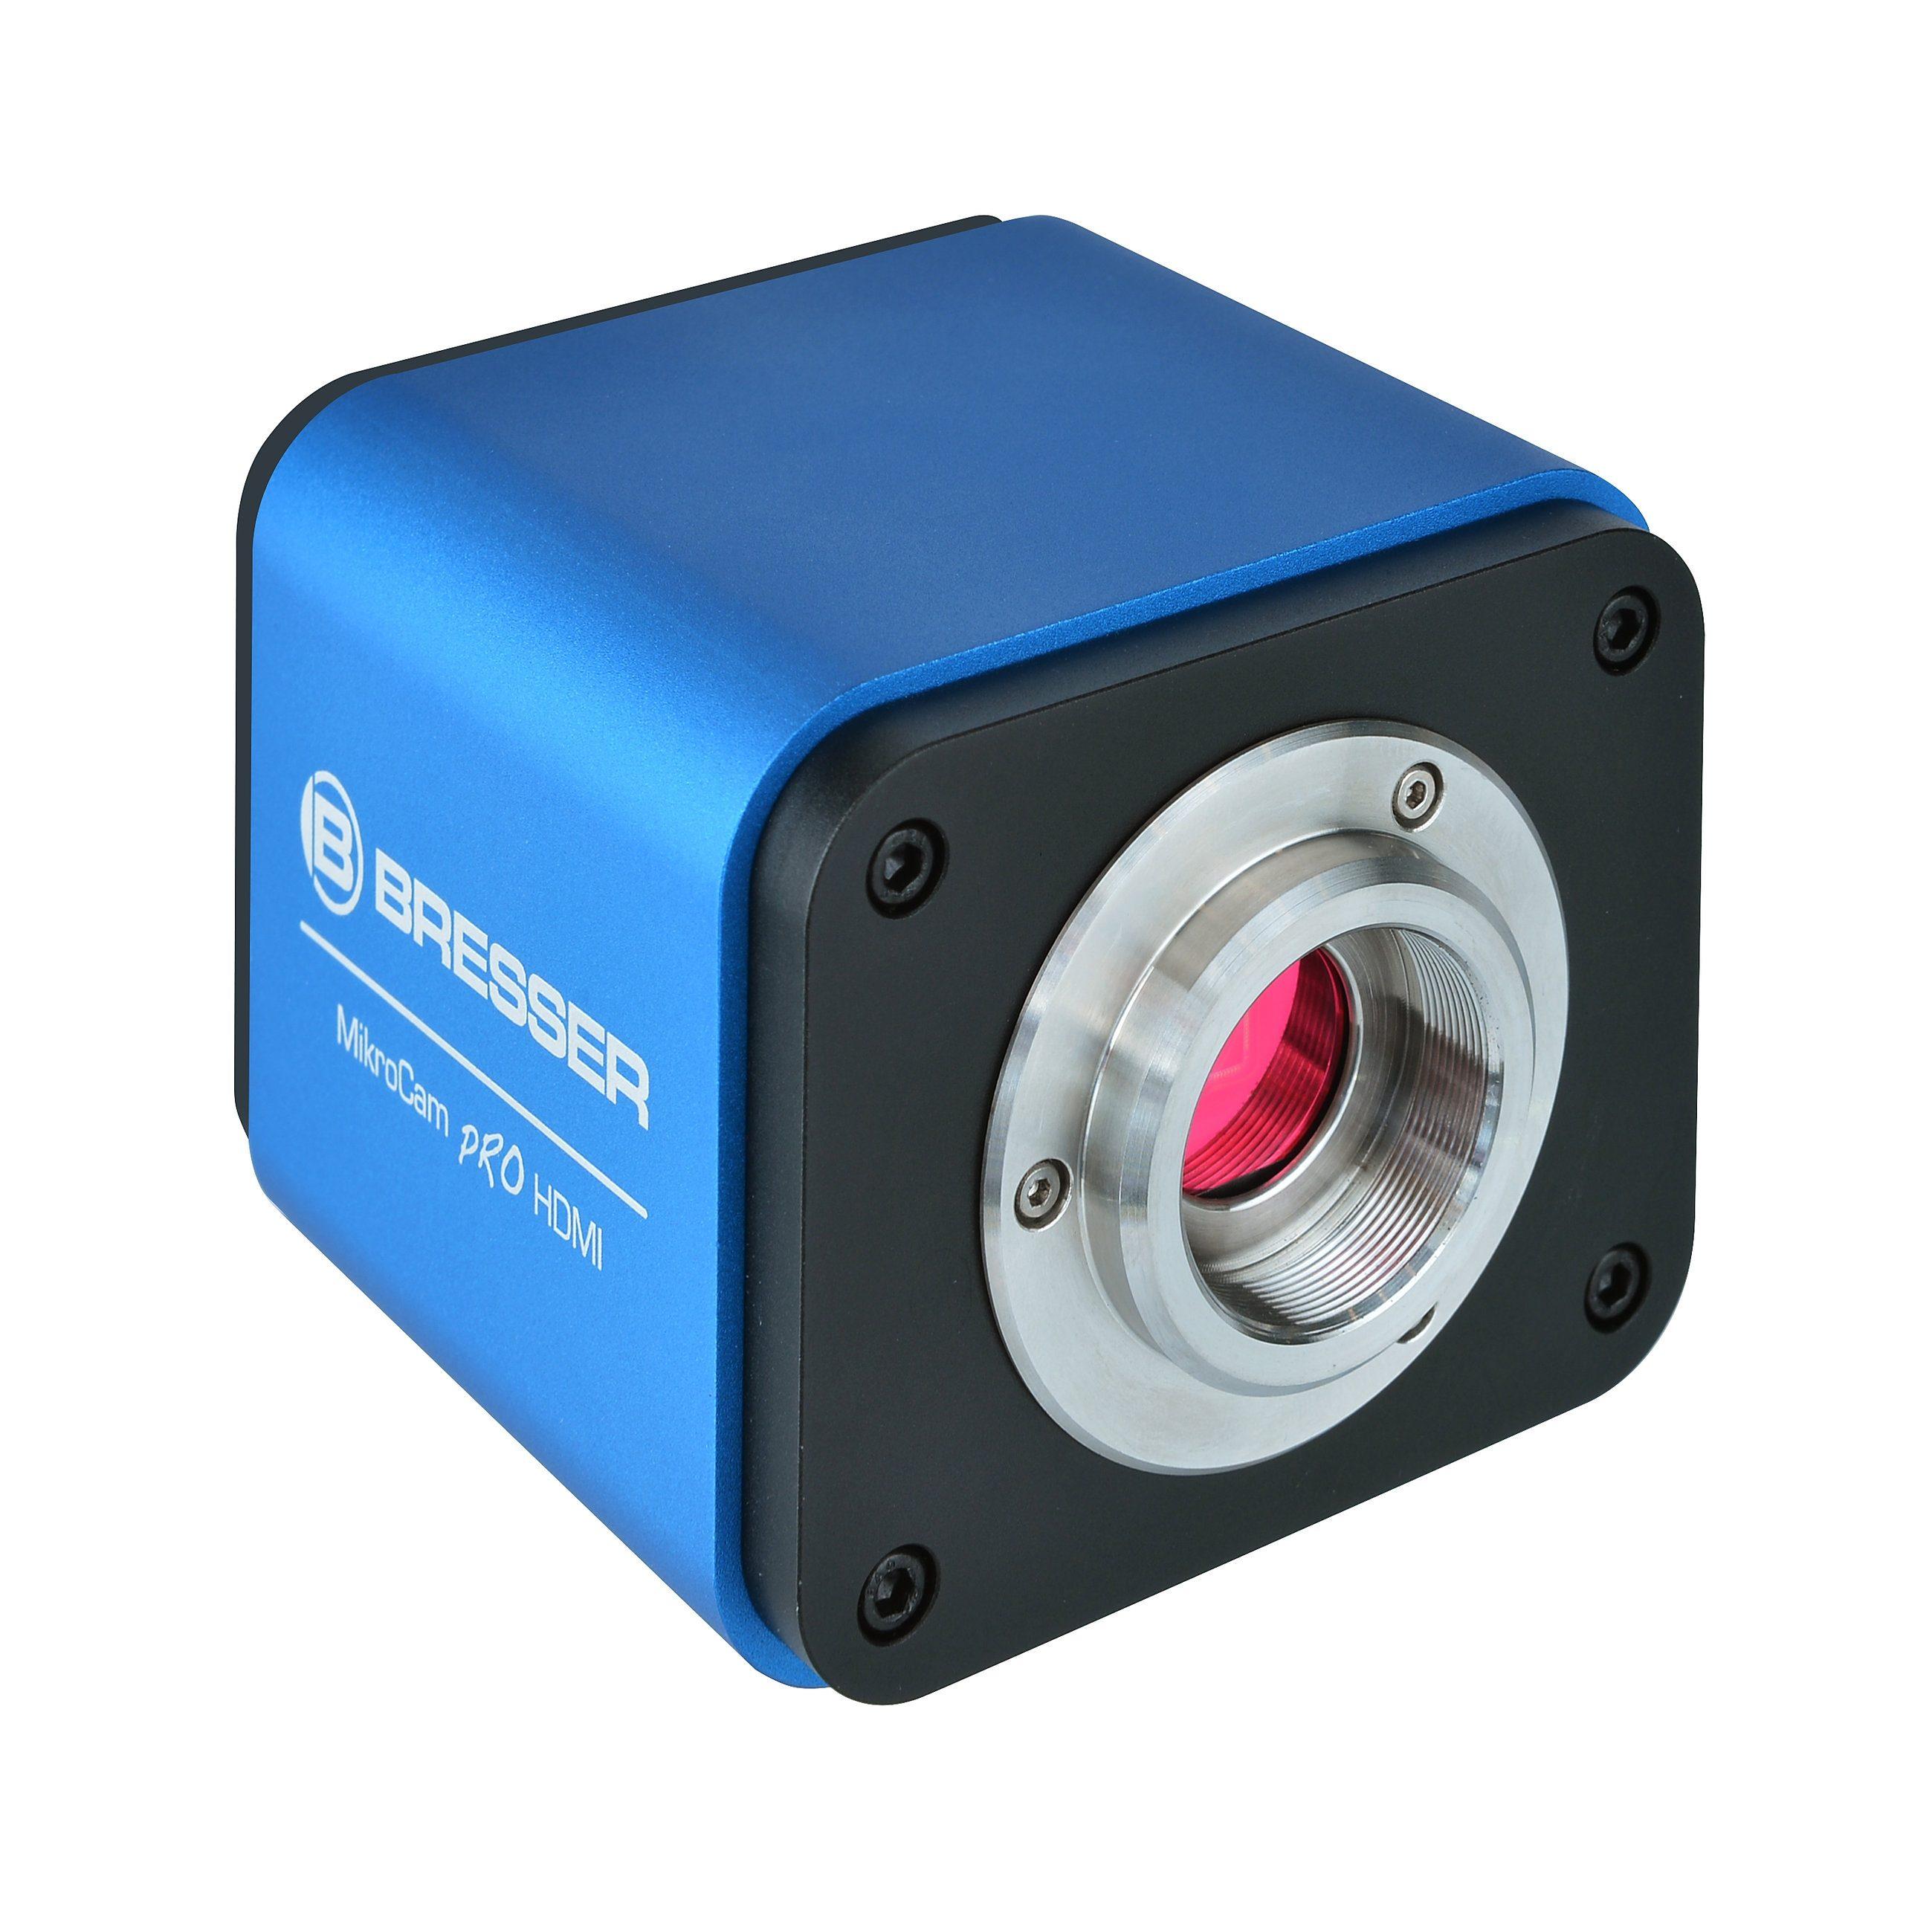 BRESSER Mikroskop »BRESSER MikroCam PRO HDMI Mikroskopkamera«